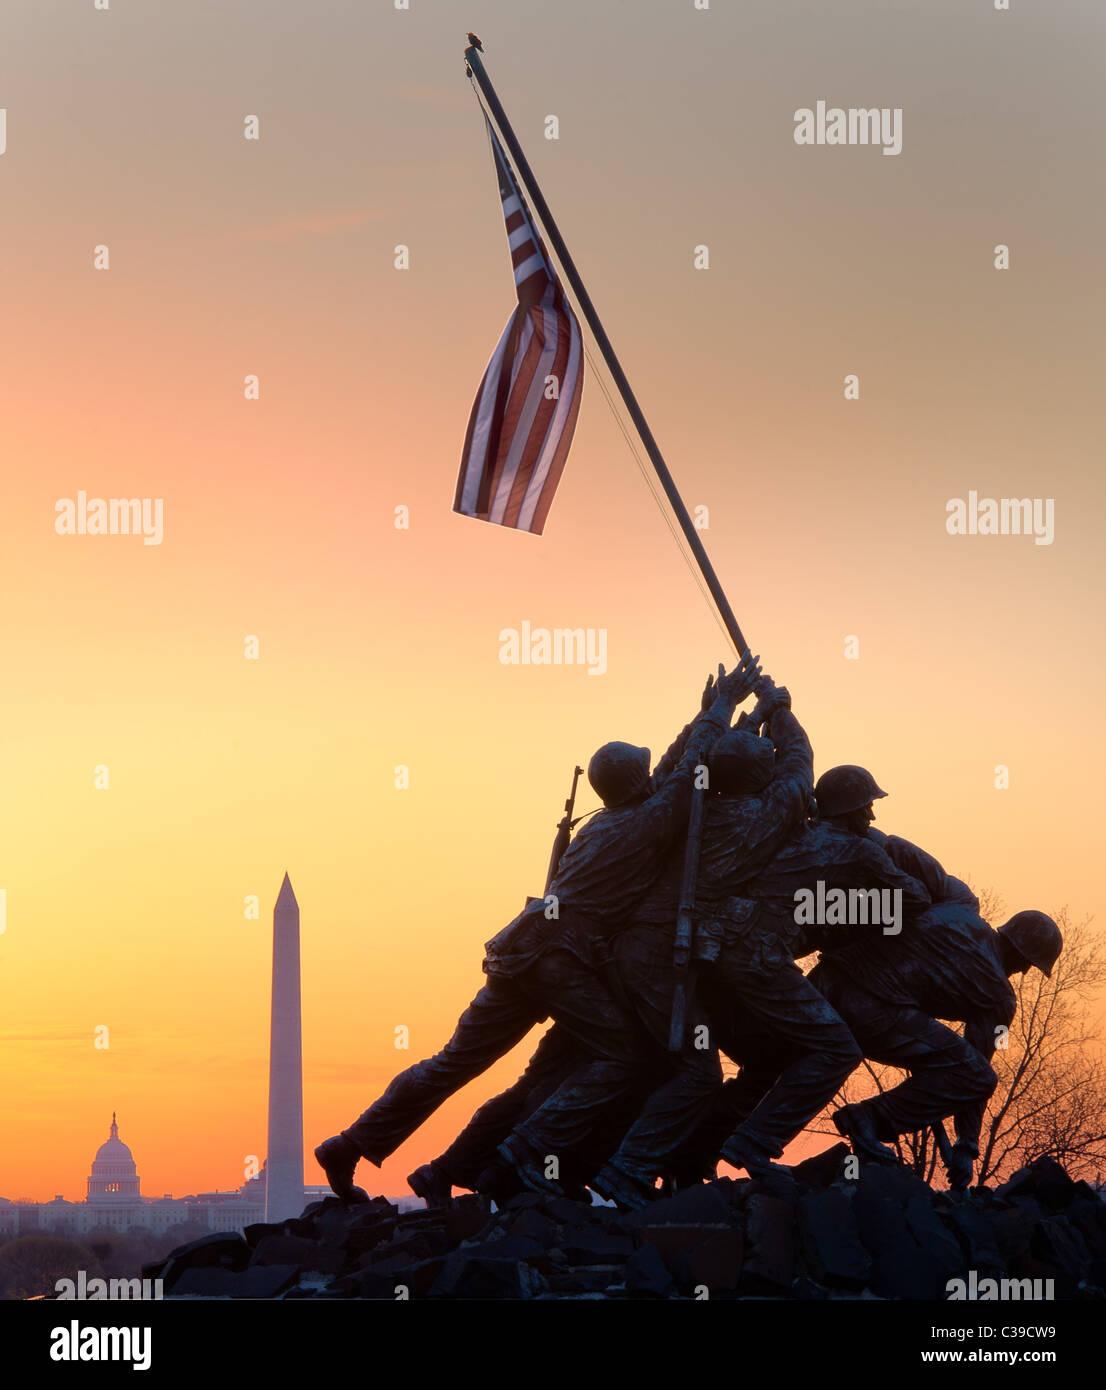 Das Marine Corps War Memorial in Arlington, VA bei Sonnenaufgang mit dem US Capitol und dem Washington Monument Stockbild